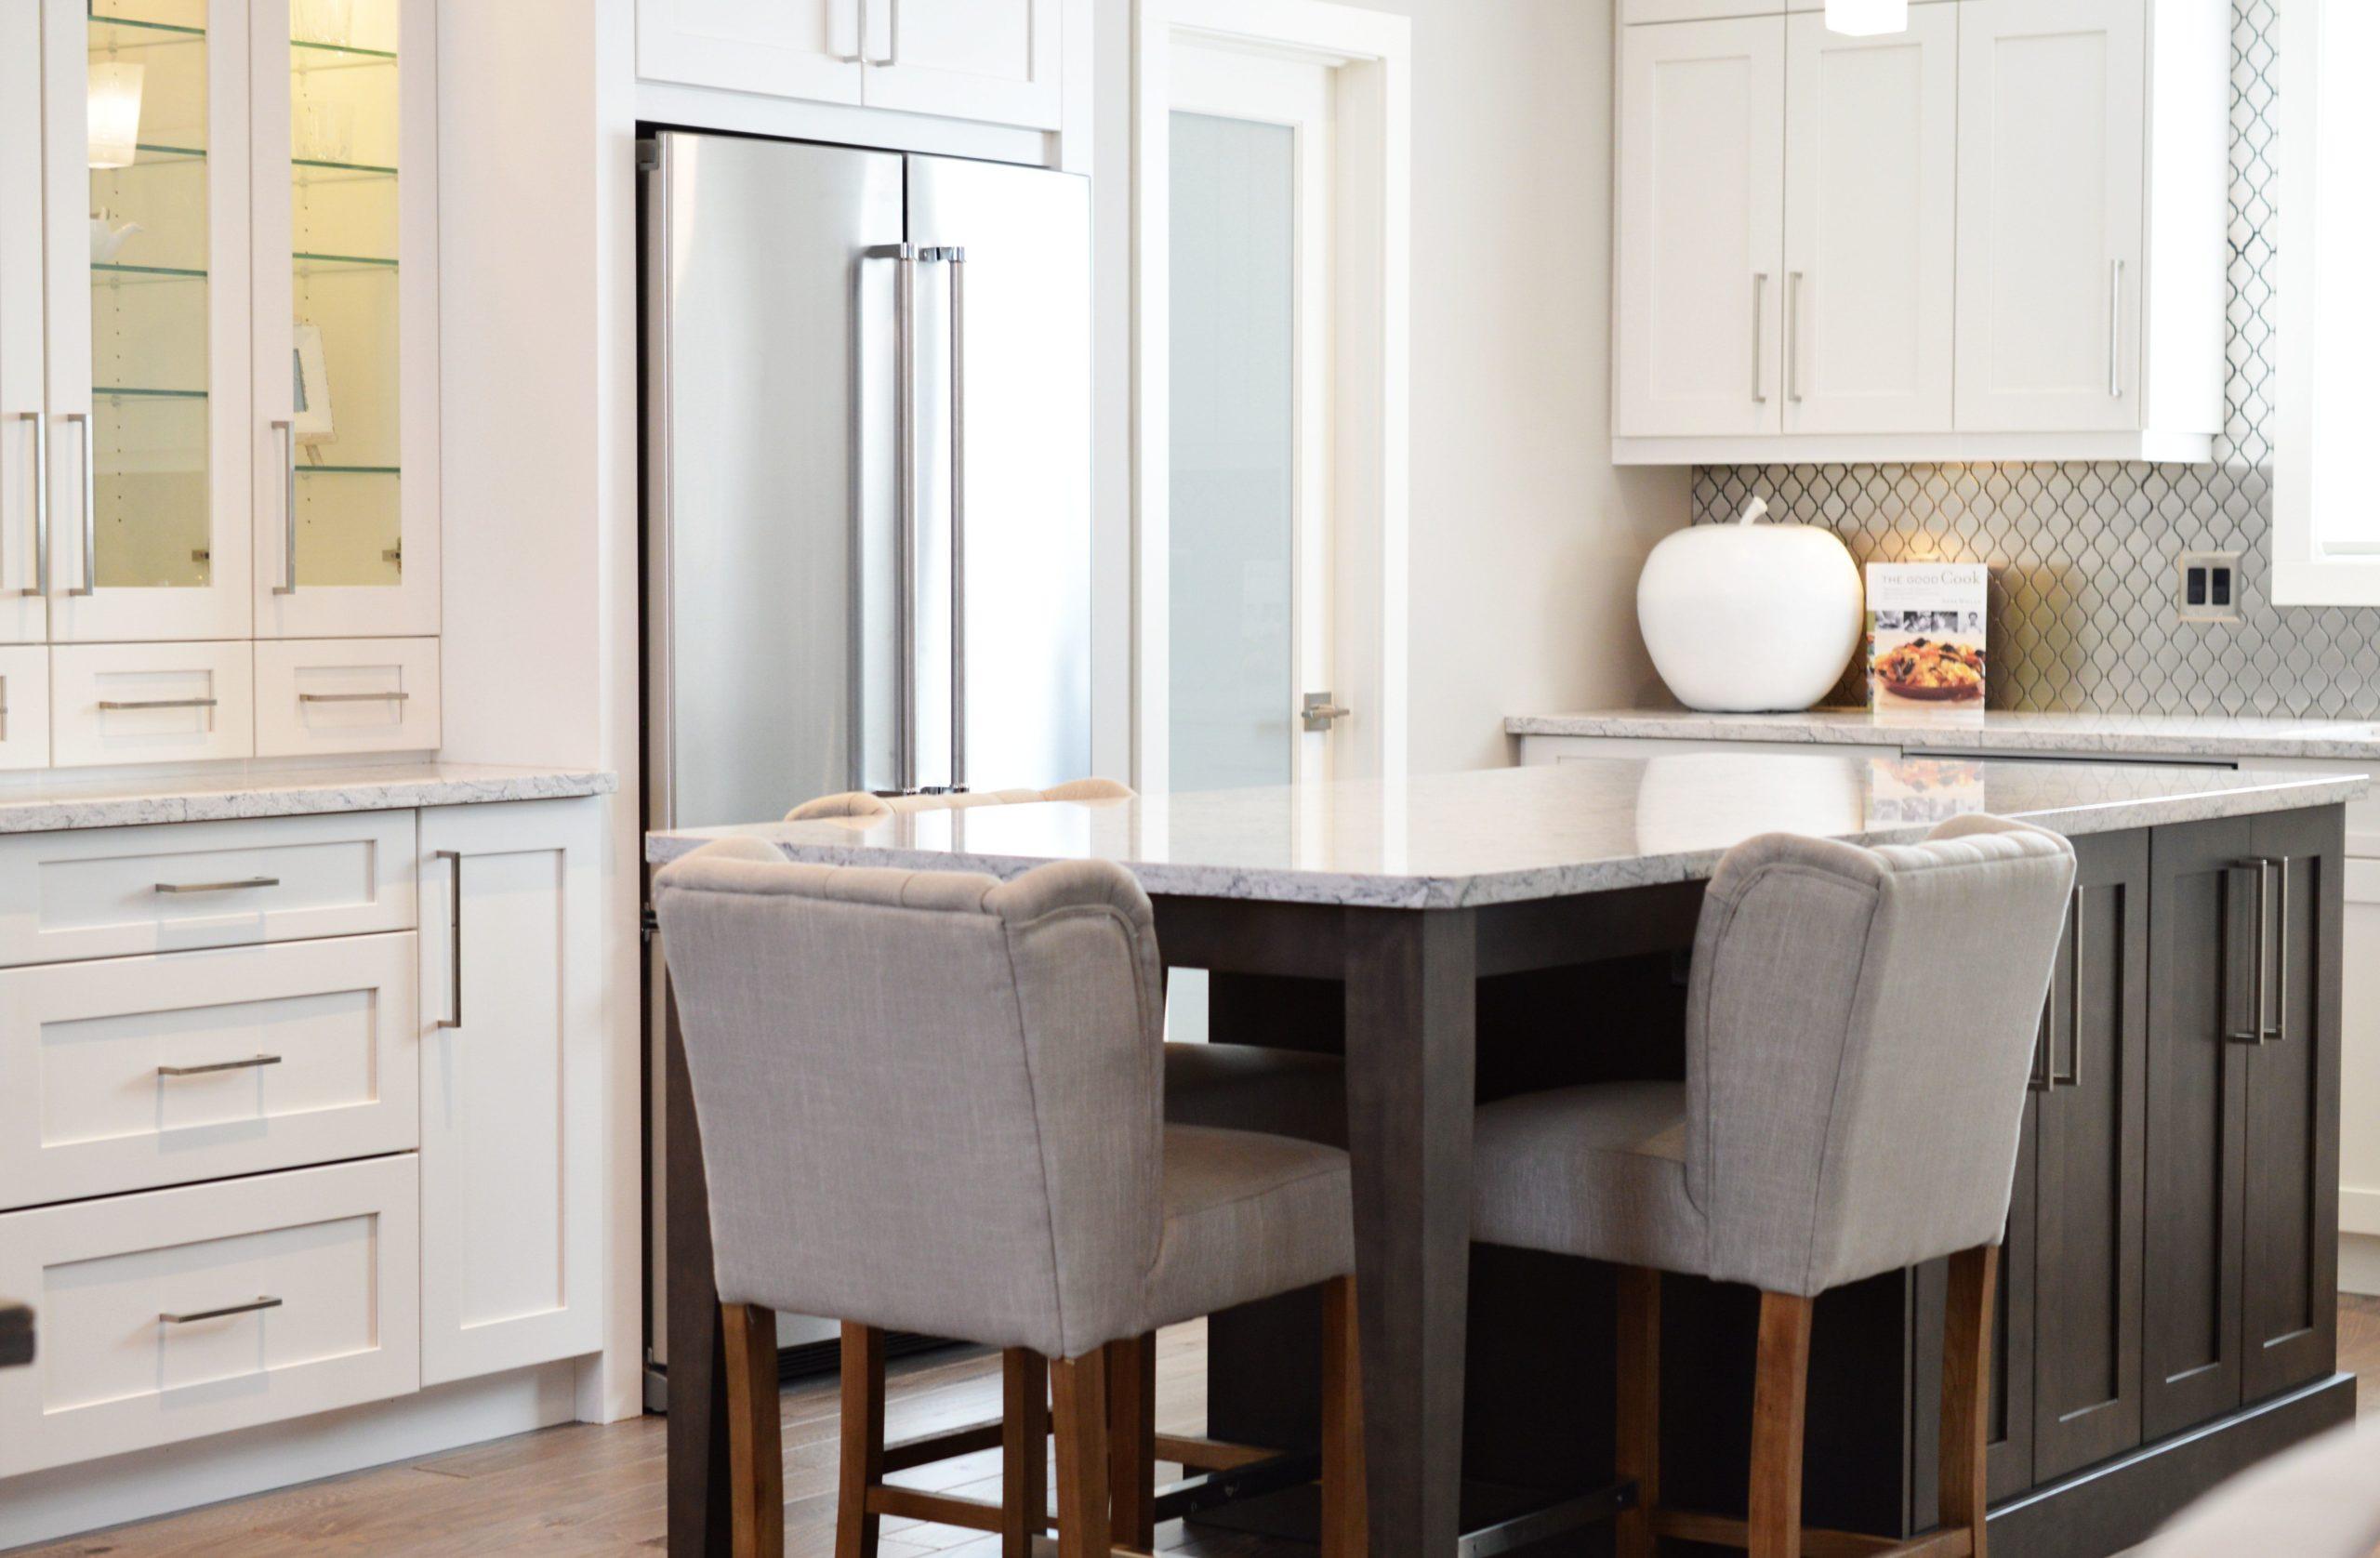 Tendencias: consejos prácticos para decorar tu hogar